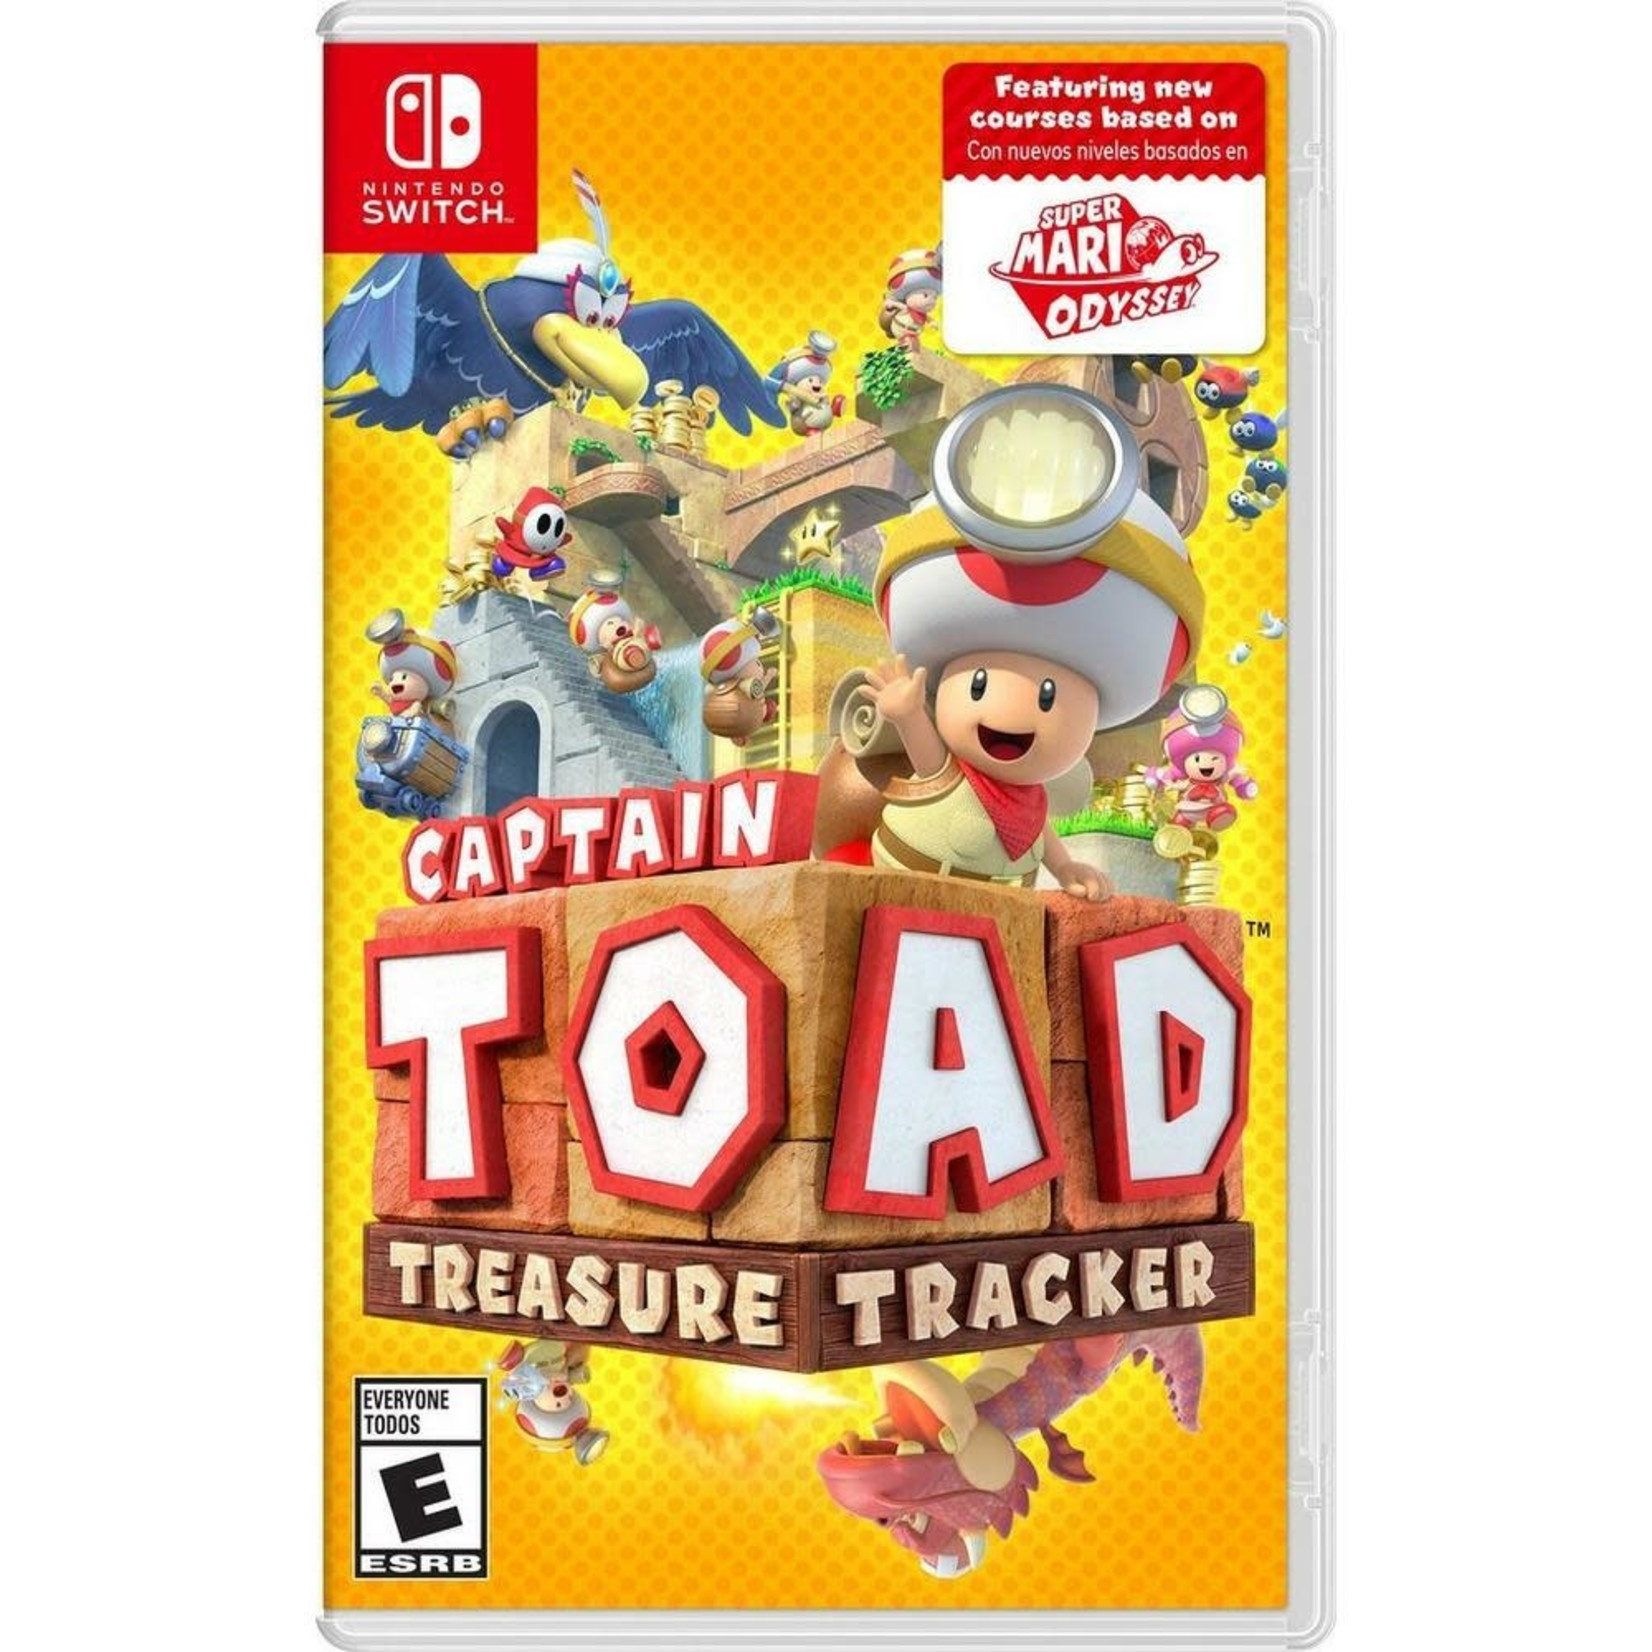 SWITCH-Captain Toad: Treasure Tracker